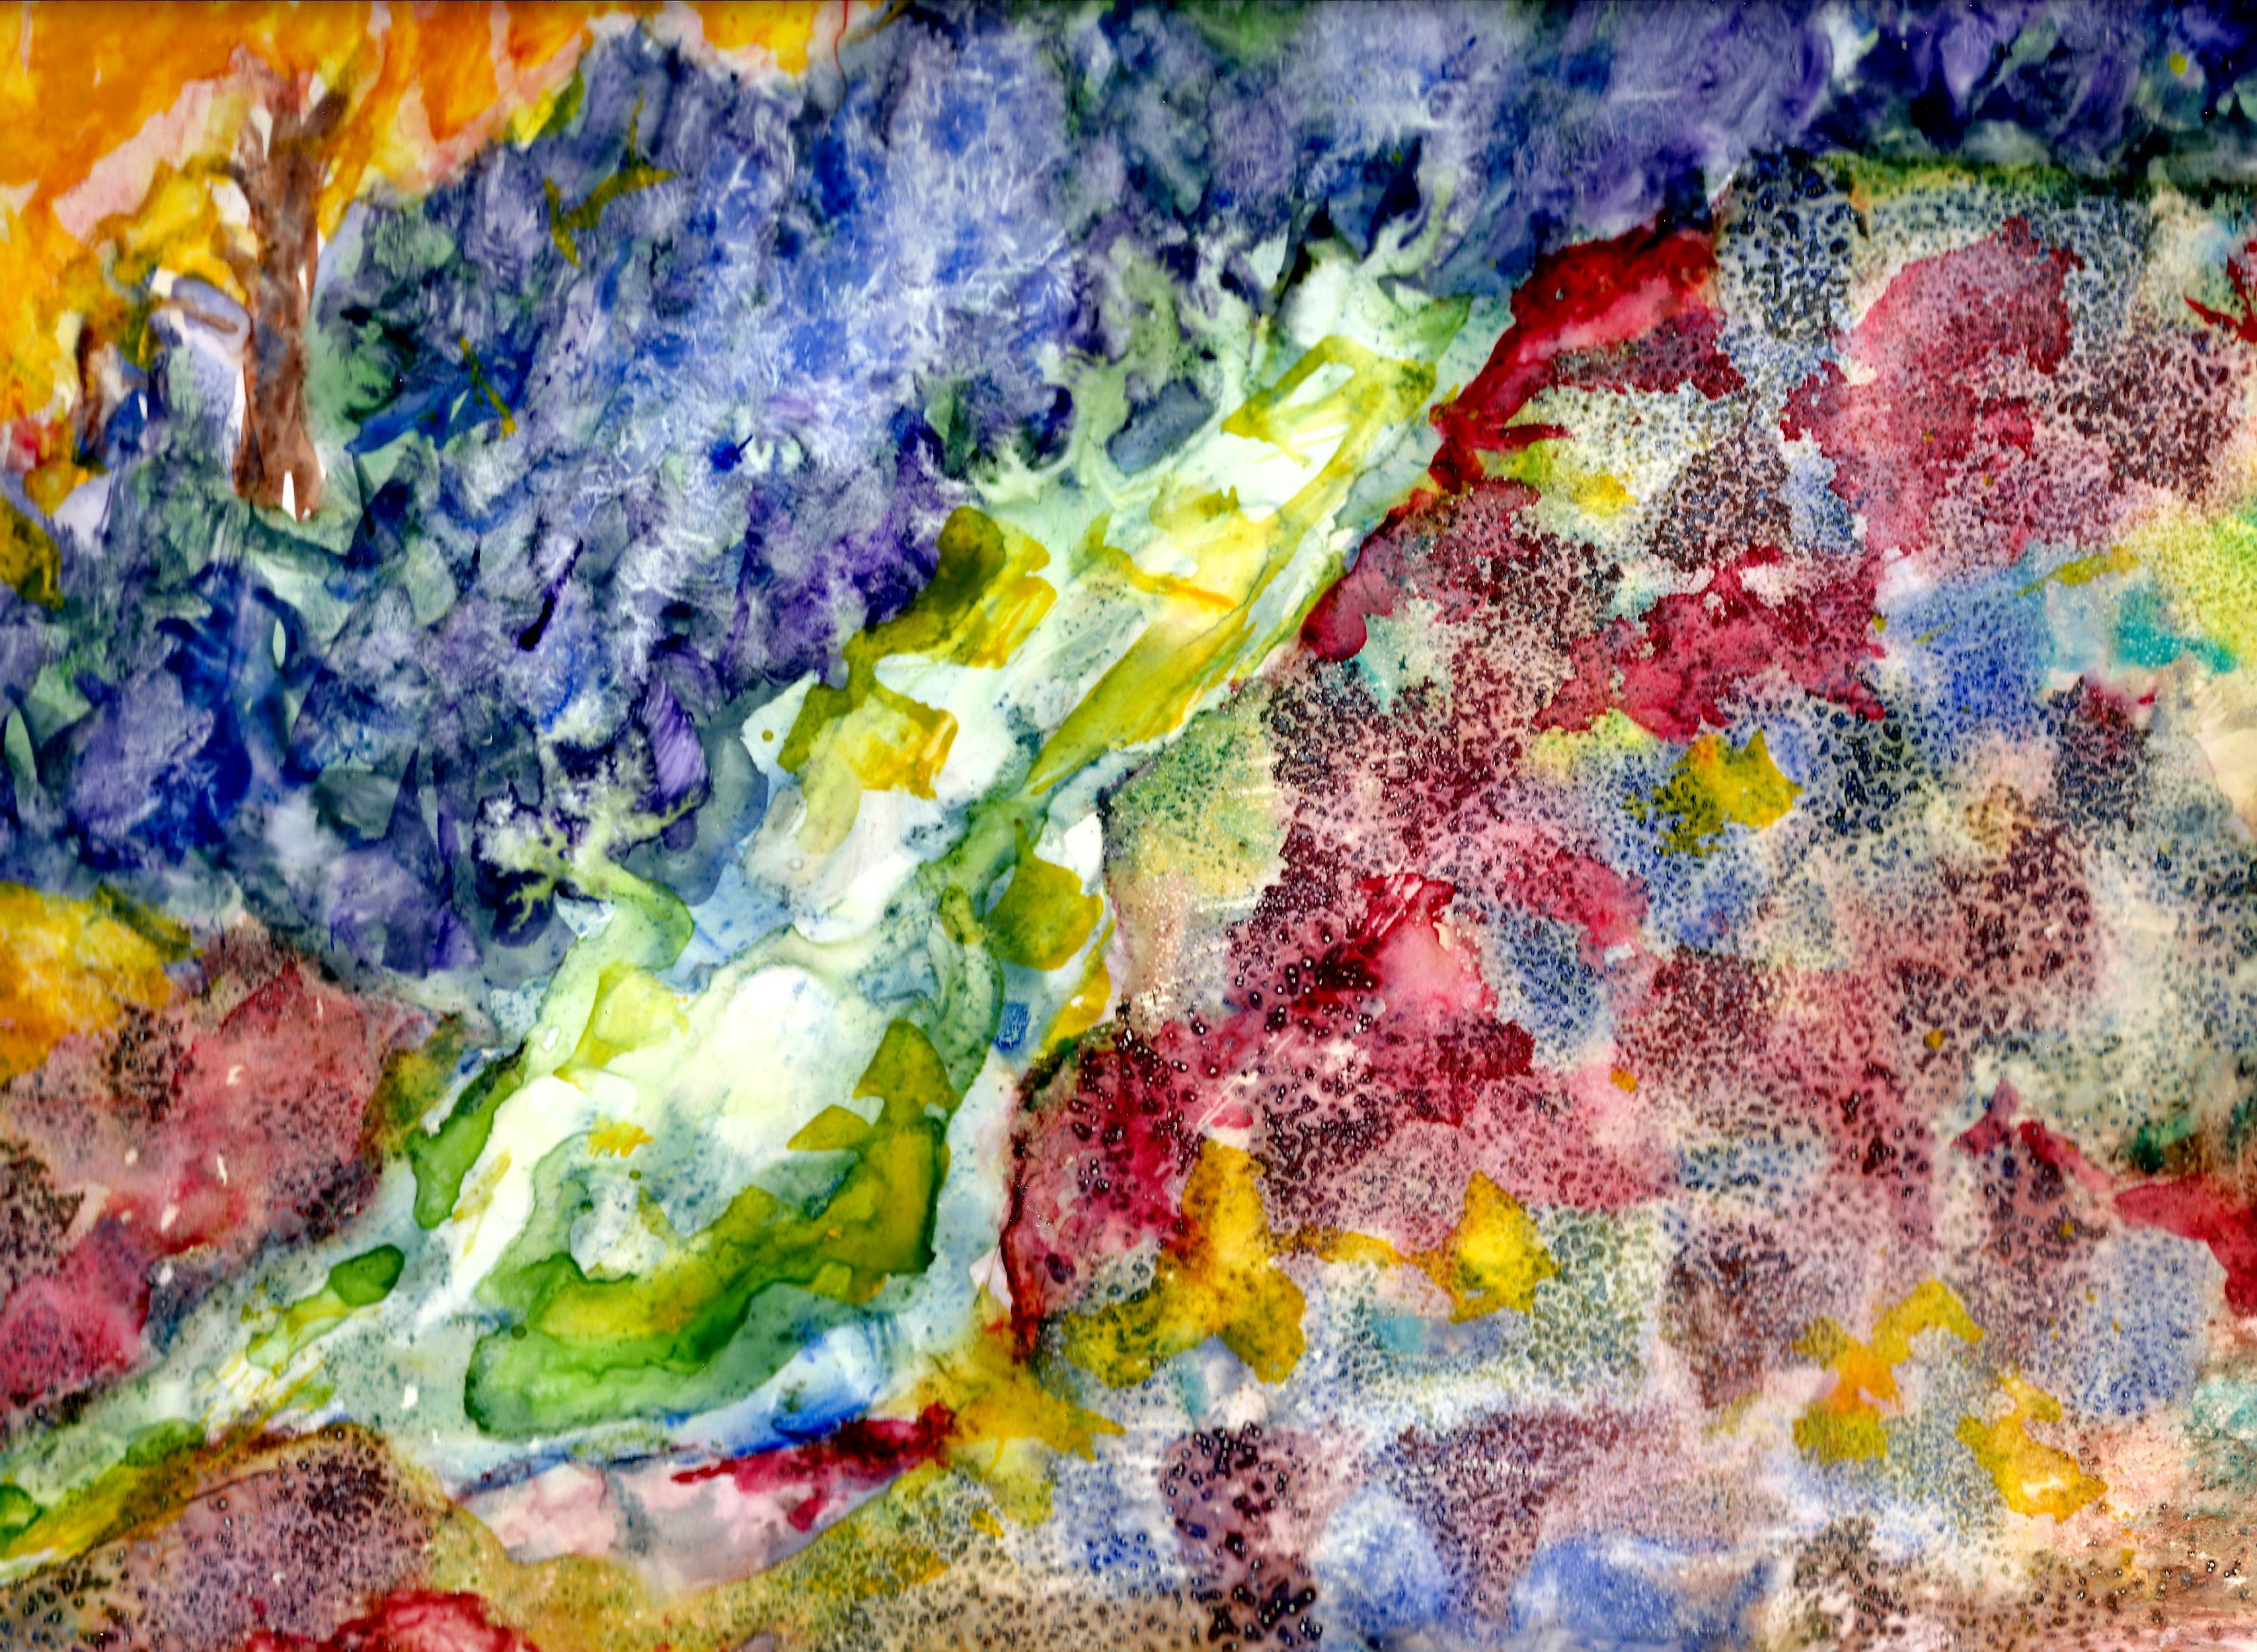 Shades of Seurat